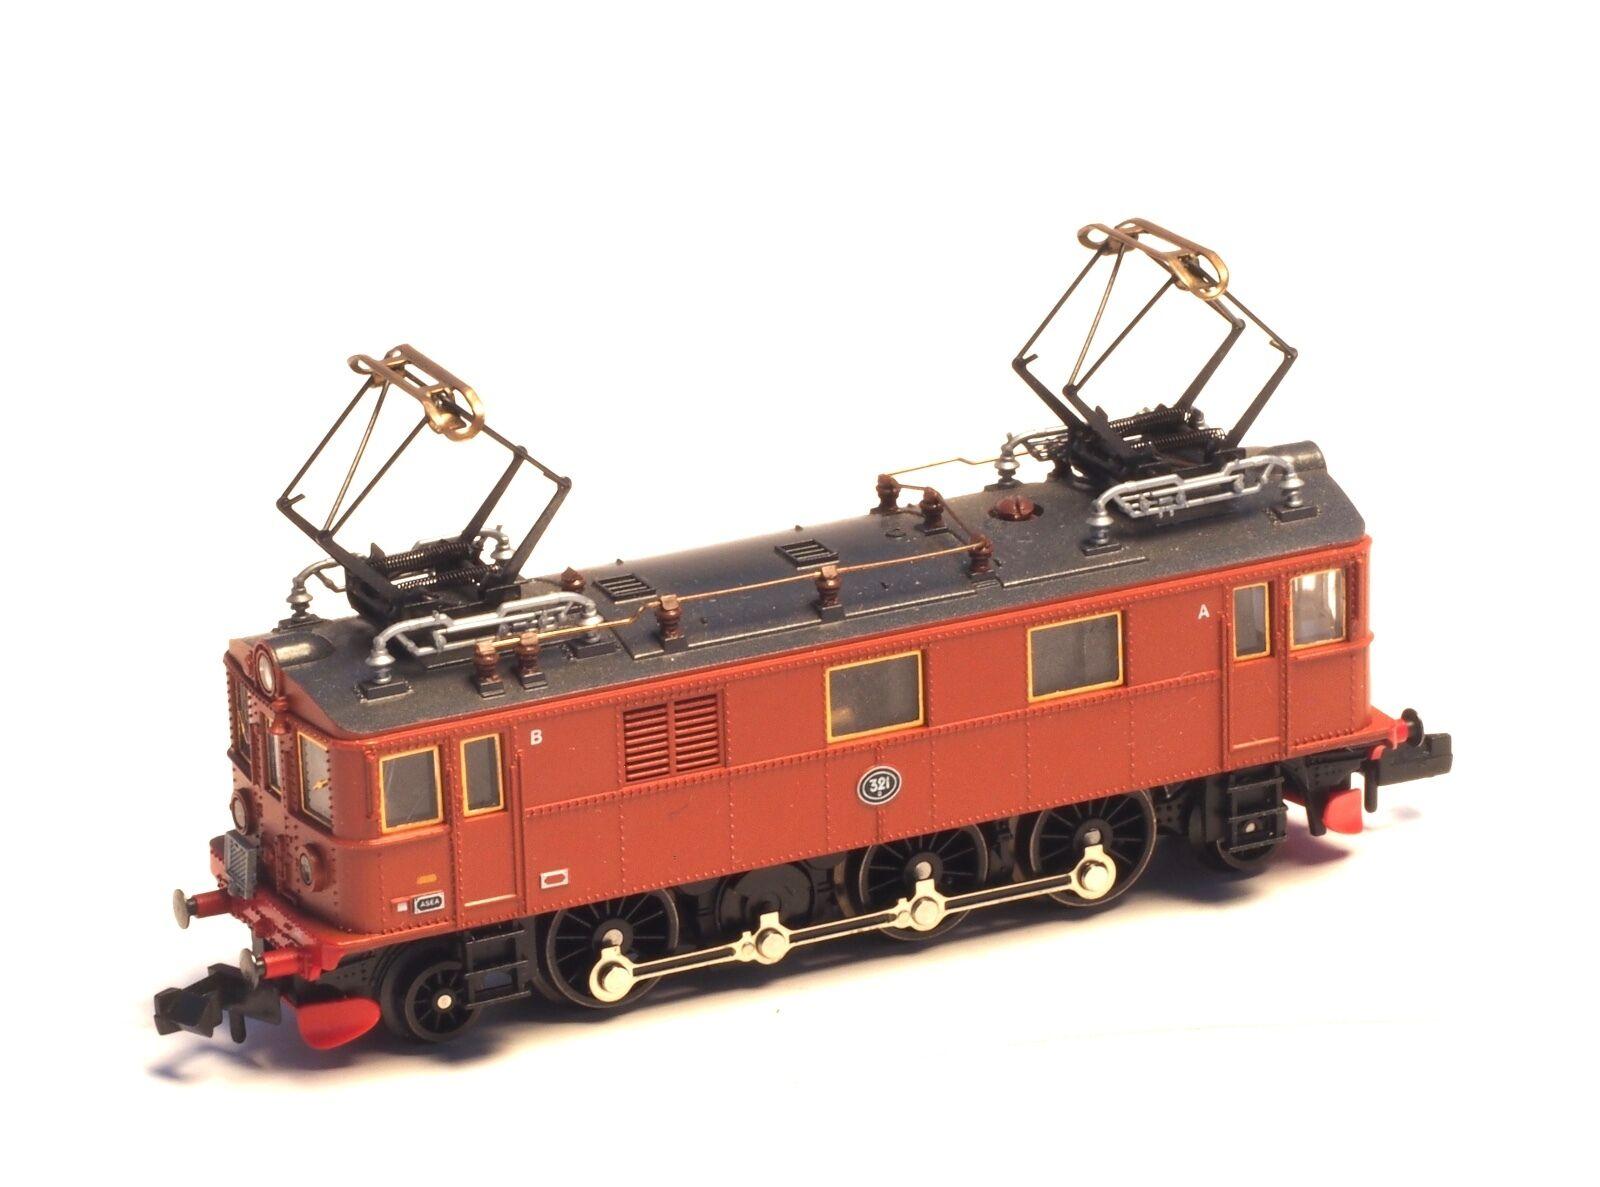 N-escala 7368 Fleischmann Eléctrico Loco SJ, clase du 2 Suecia, sueco RR